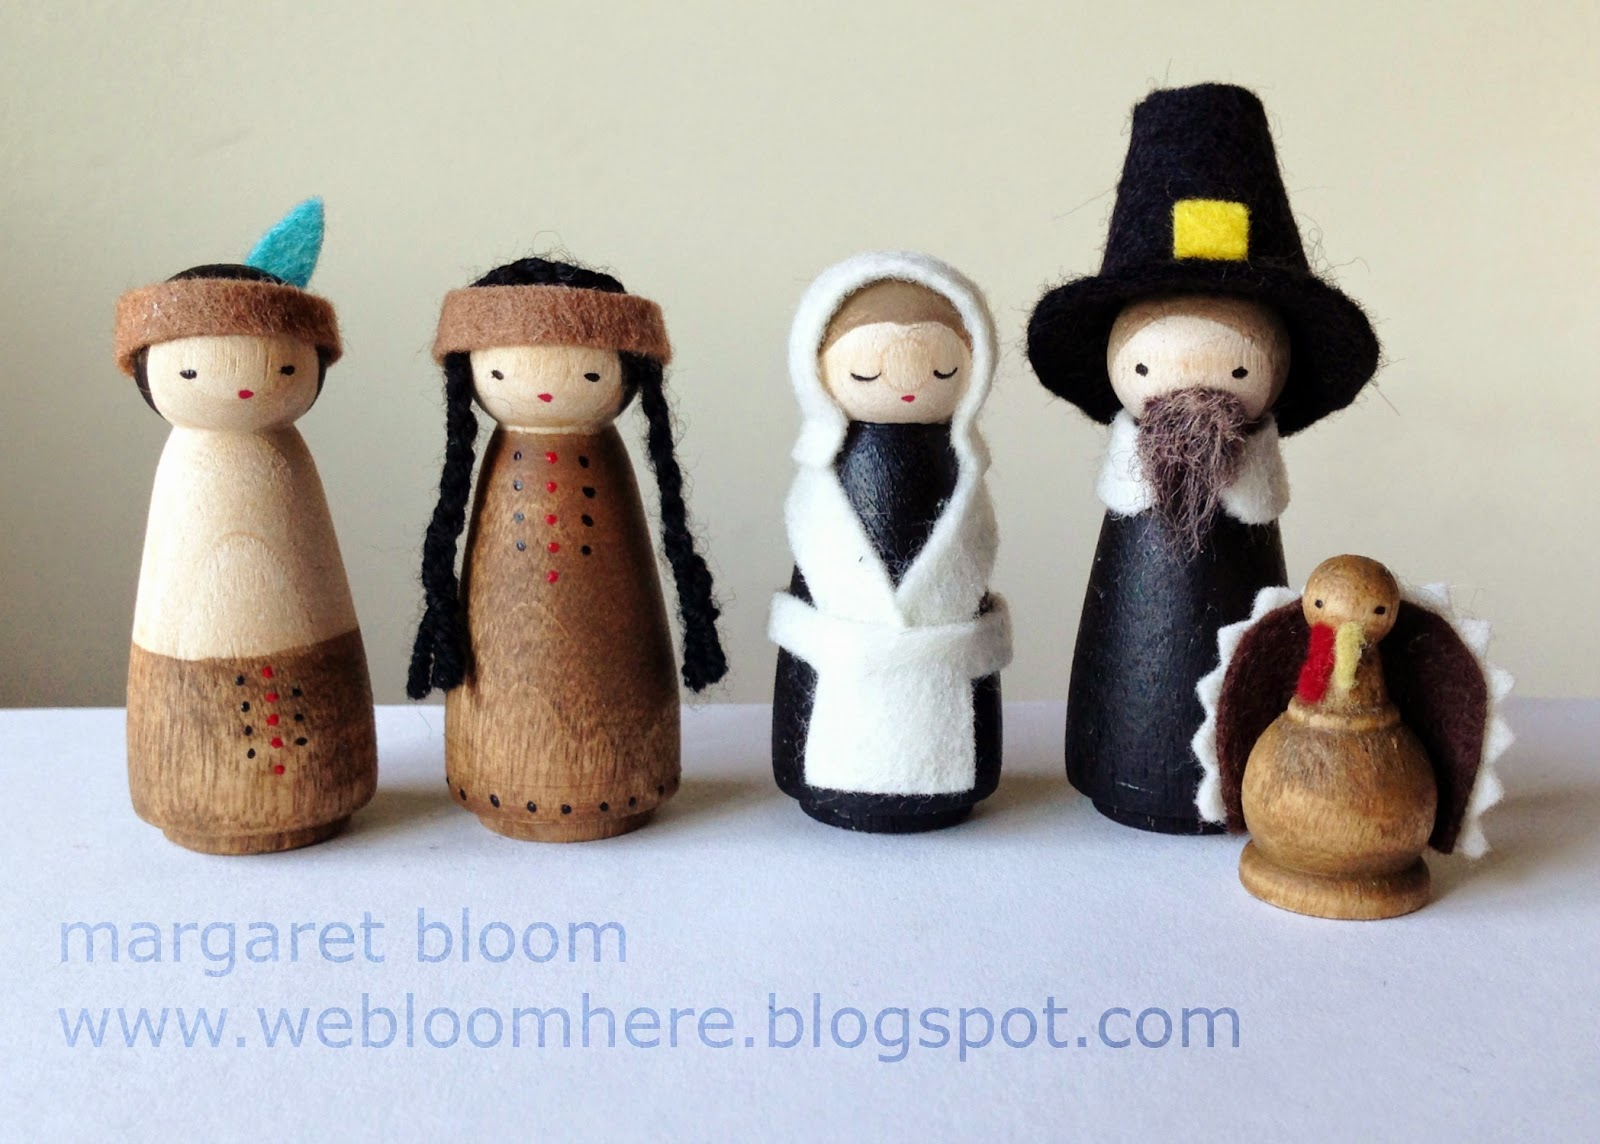 http://webloomhere.blogspot.com/2014/11/peg-doll-pilgrims-native-americans.html